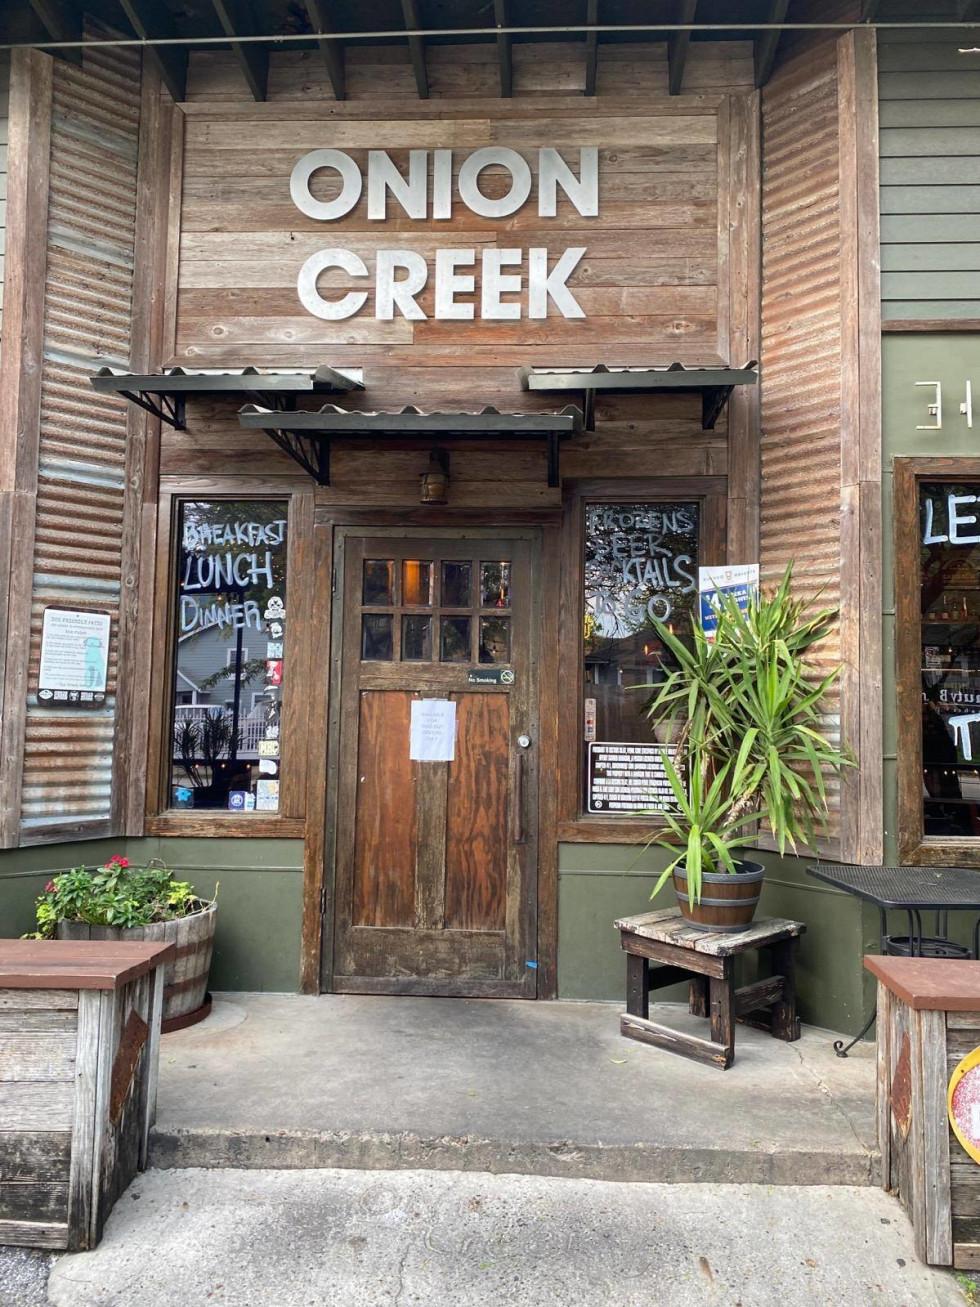 Onion Creek exterior